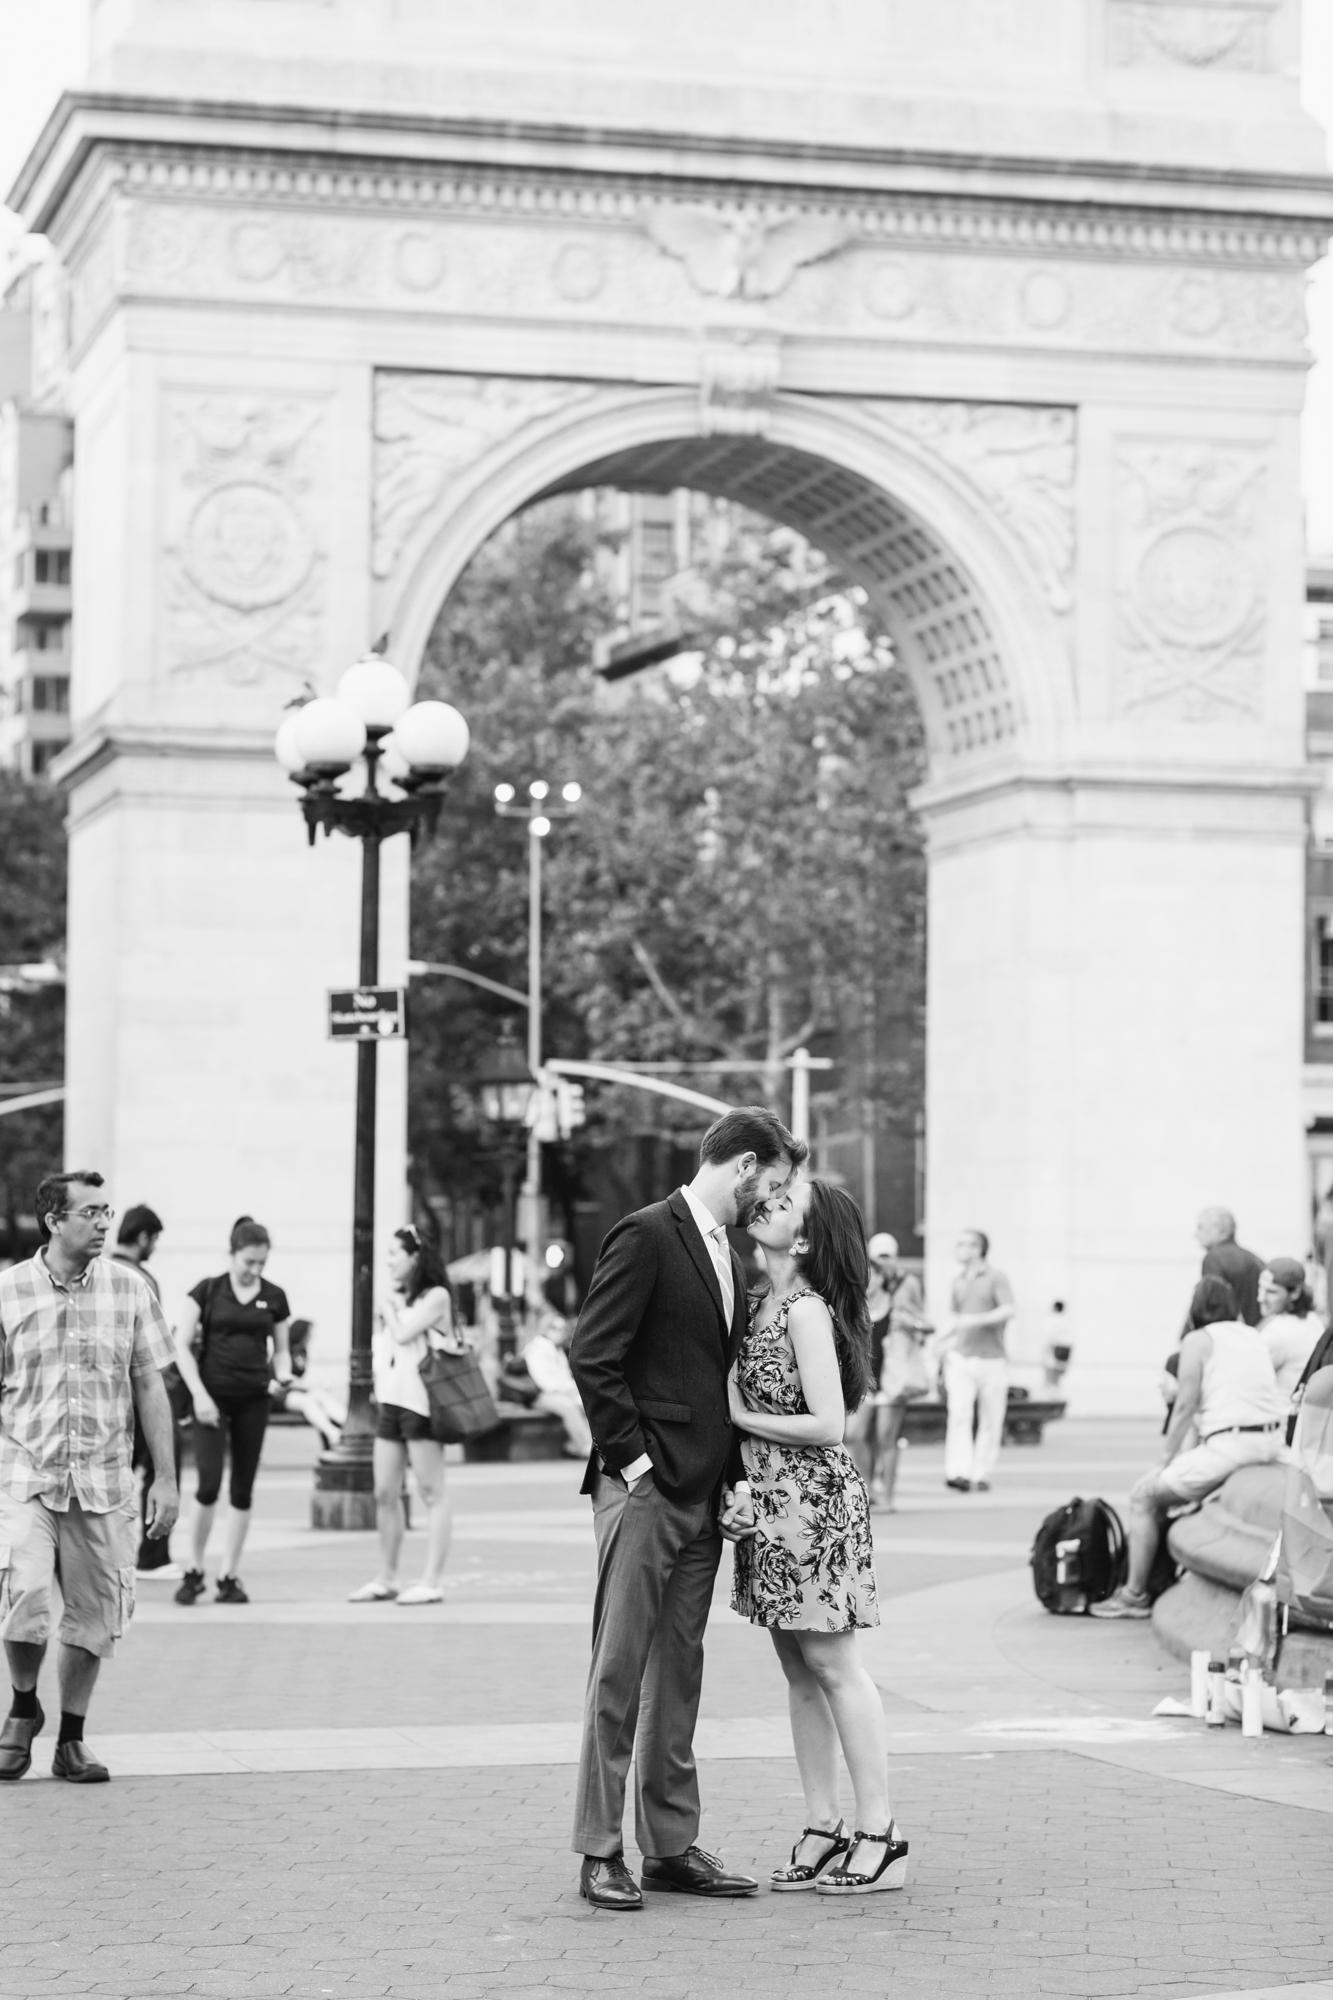 11_West_Village_New_York_Engagement_Photos_131.jpg